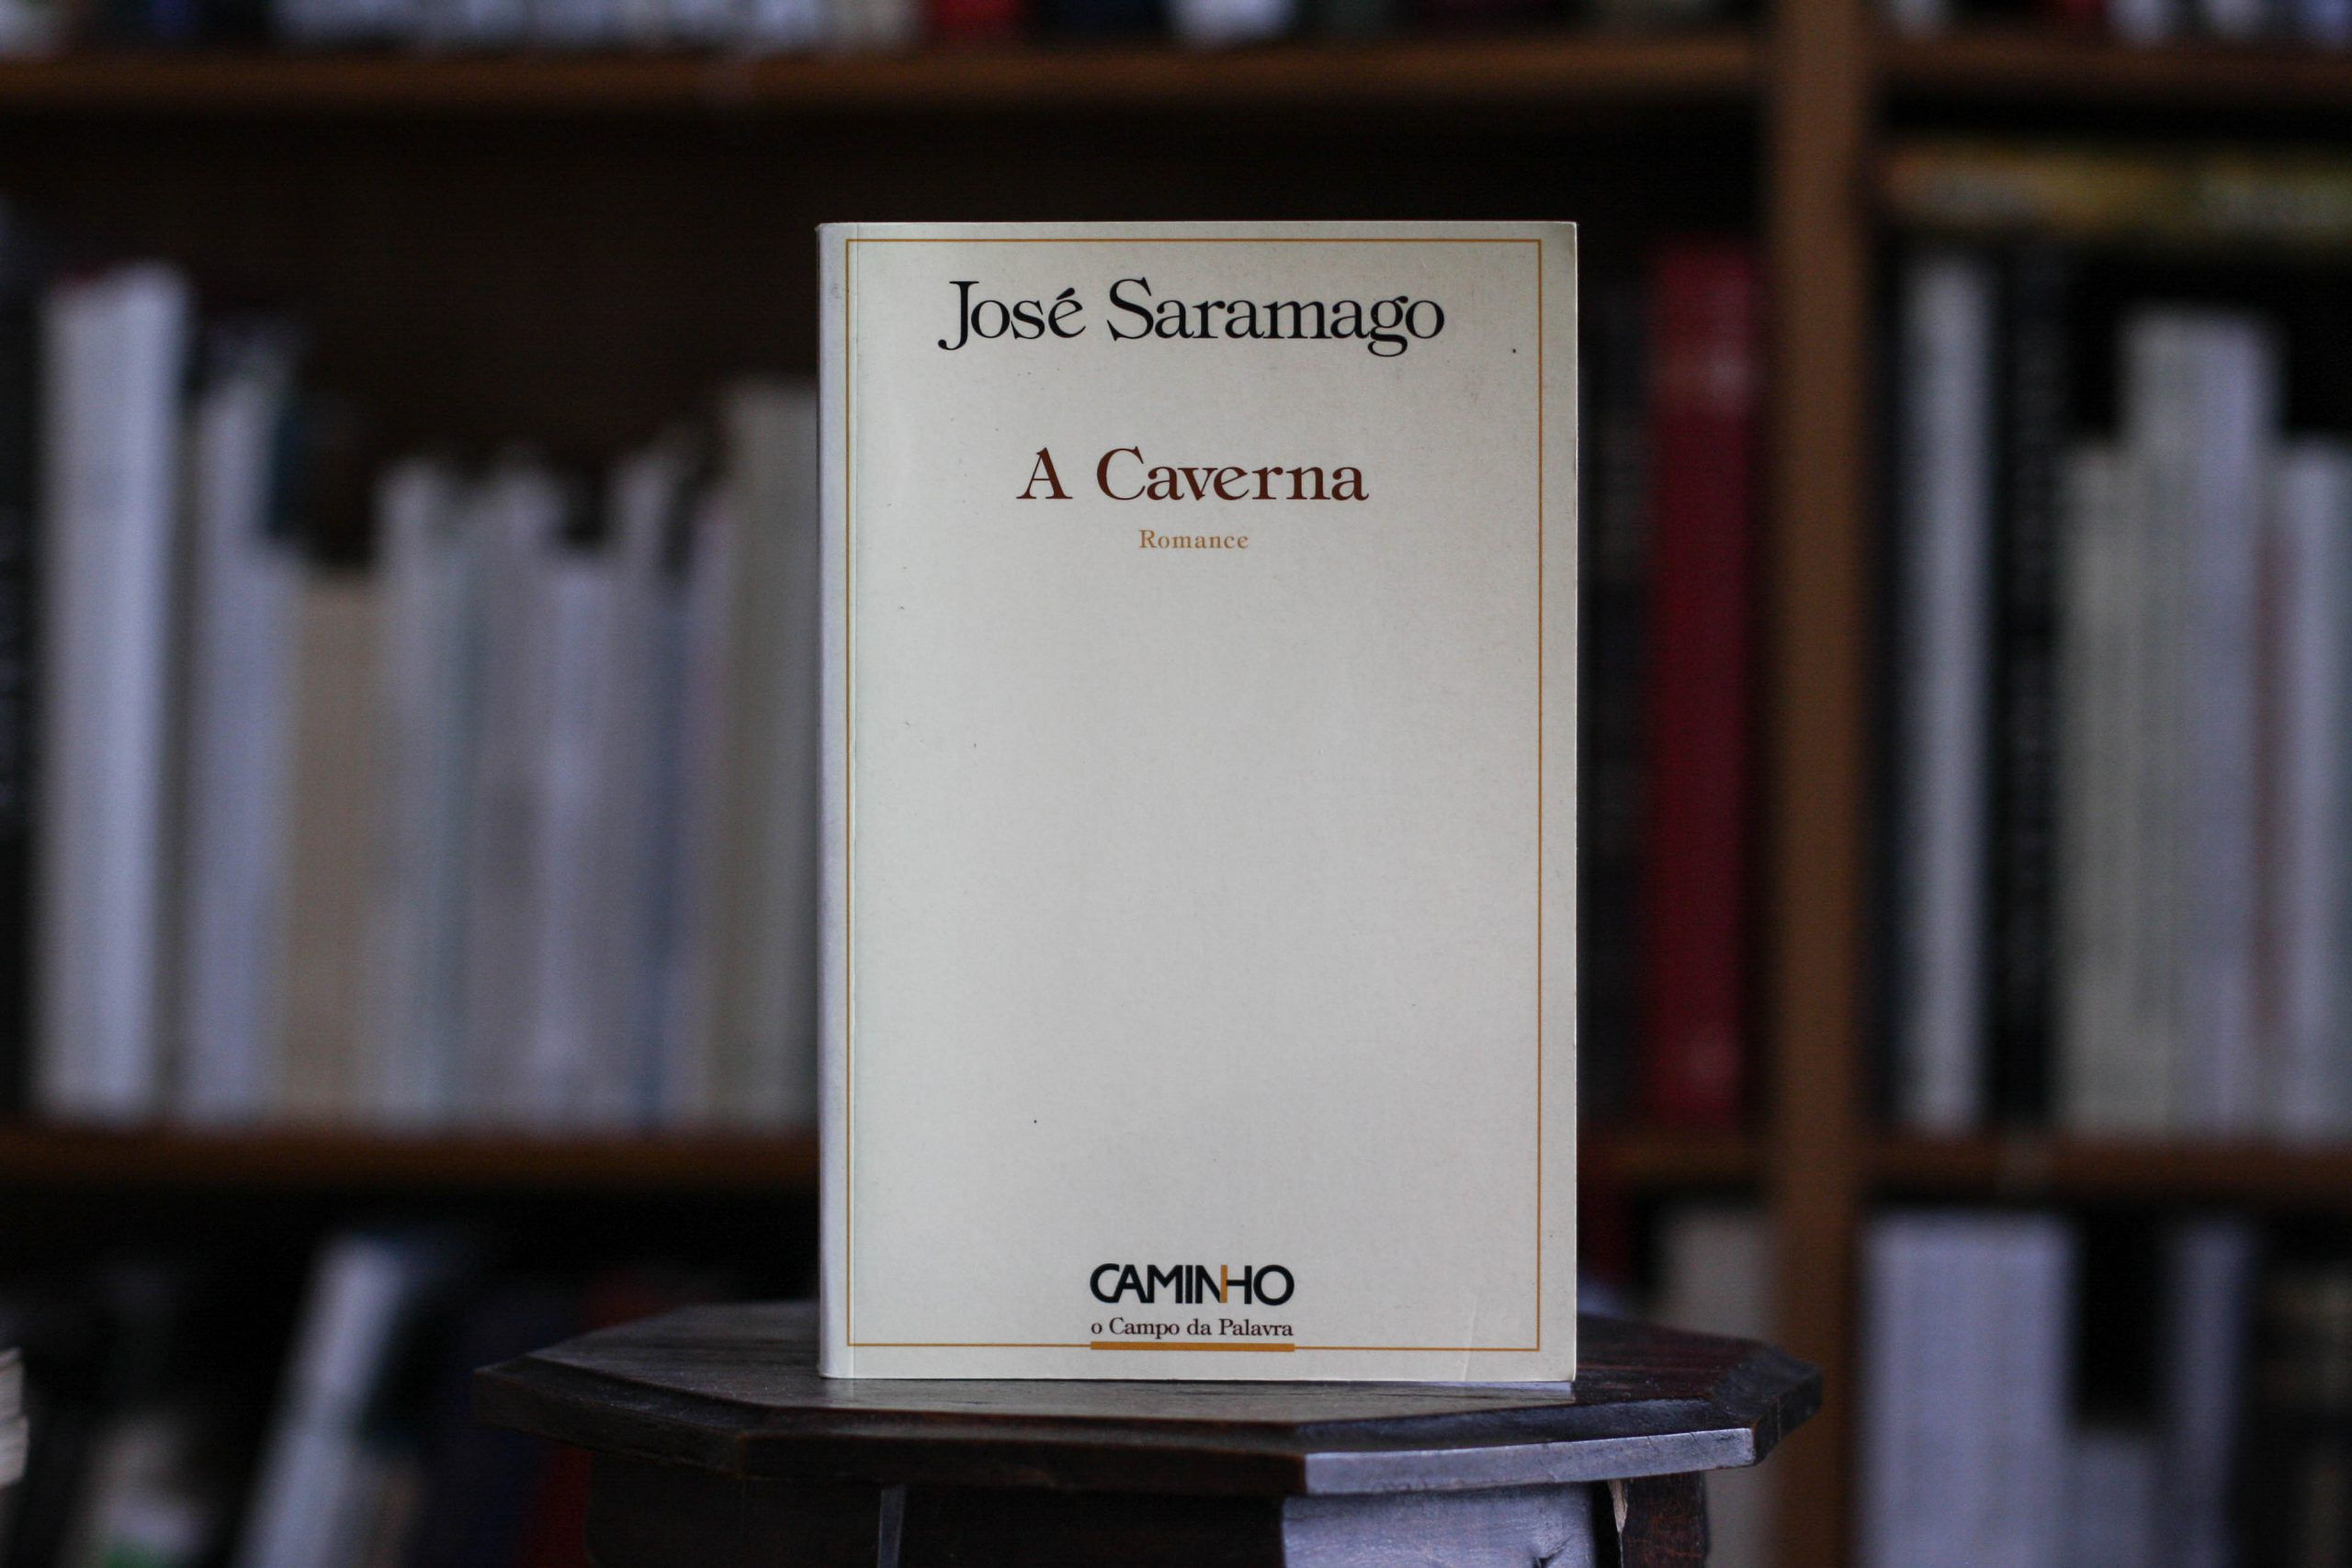 José Saramago, 'A Caverna', 1ª edição (Passatempo)